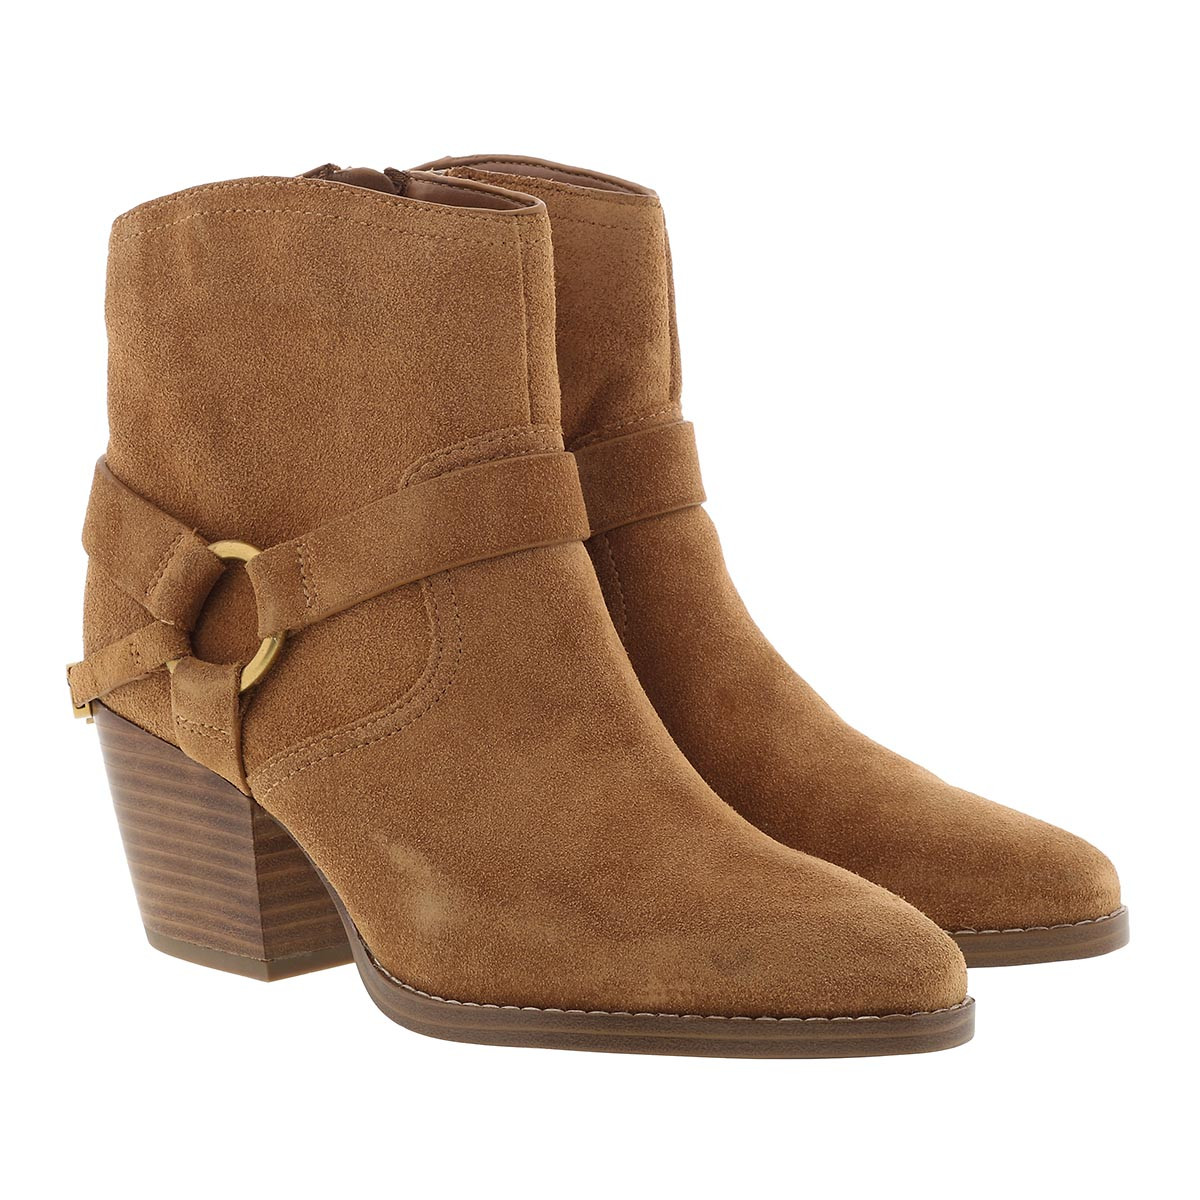 Michael Kors Boots - Goldie Booties Acorn - in braun - für Damen